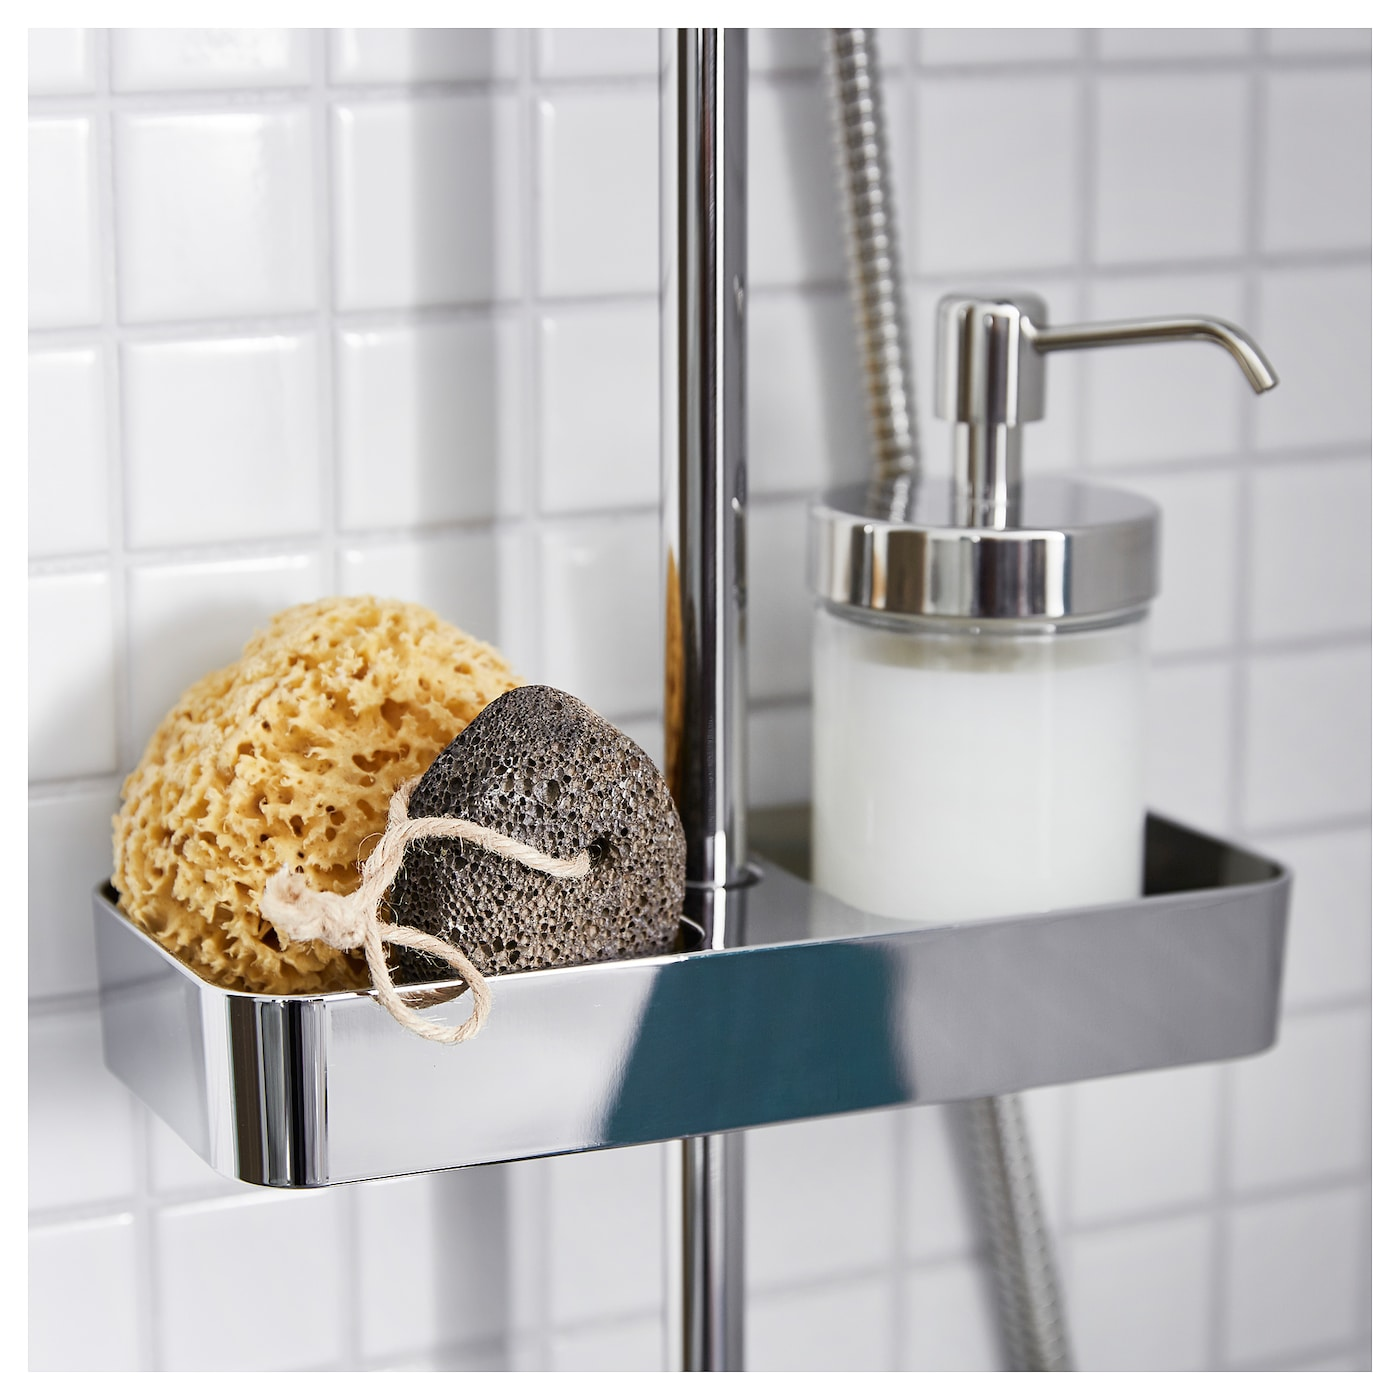 BROGRUND Shower shelf, chrome-plated, 25x4 cm